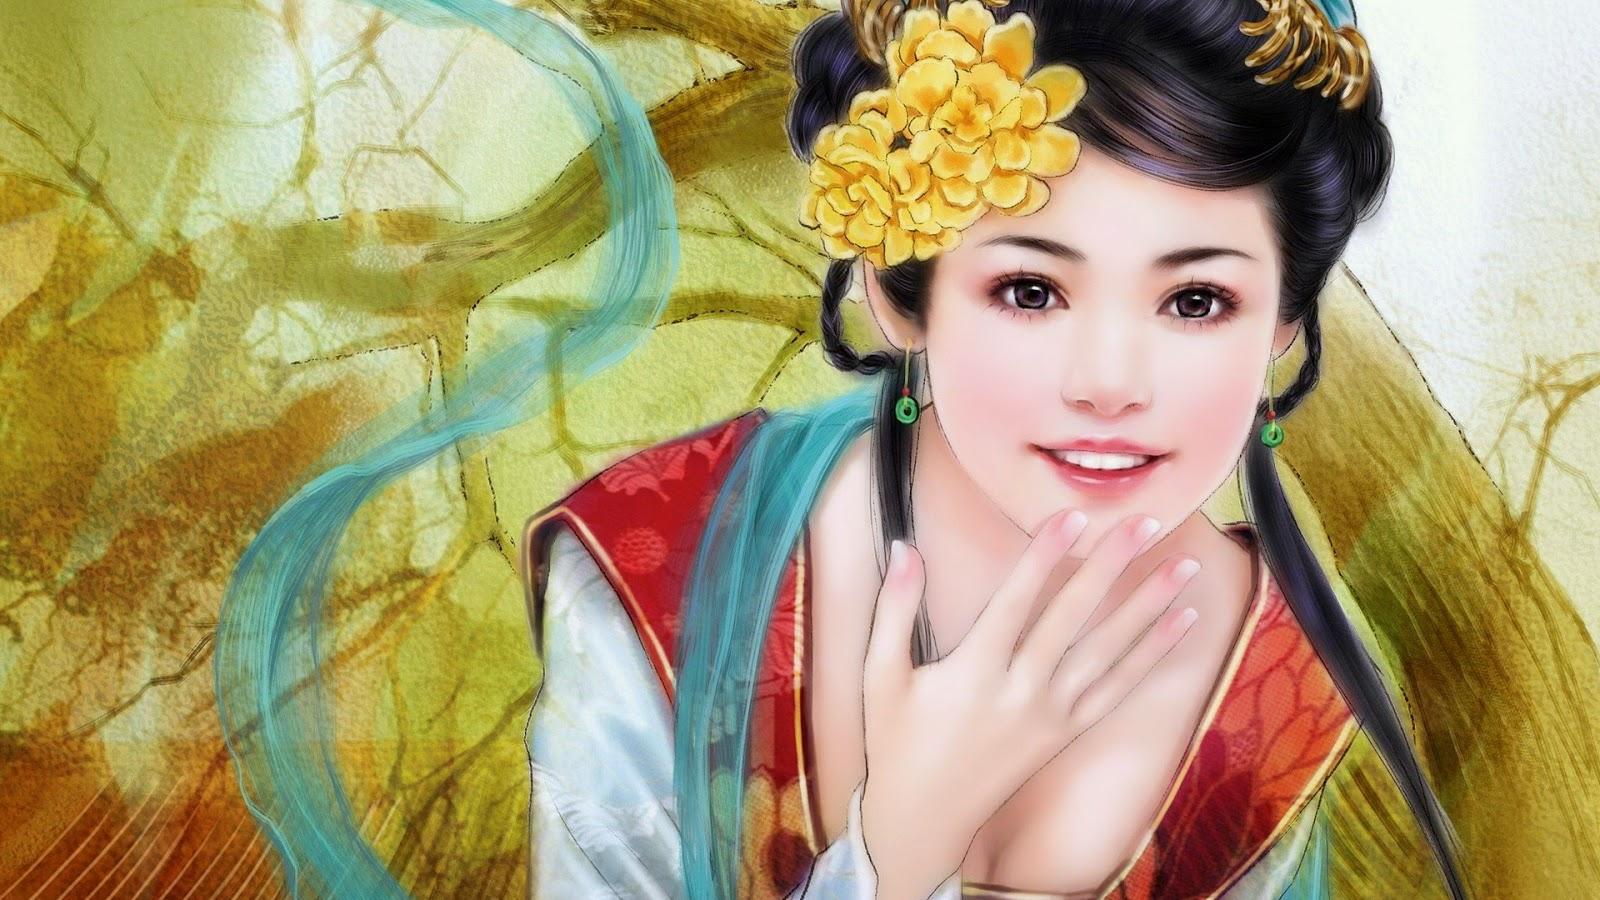 japanese anime beautiful girl wallpaper - free wallpaper hd